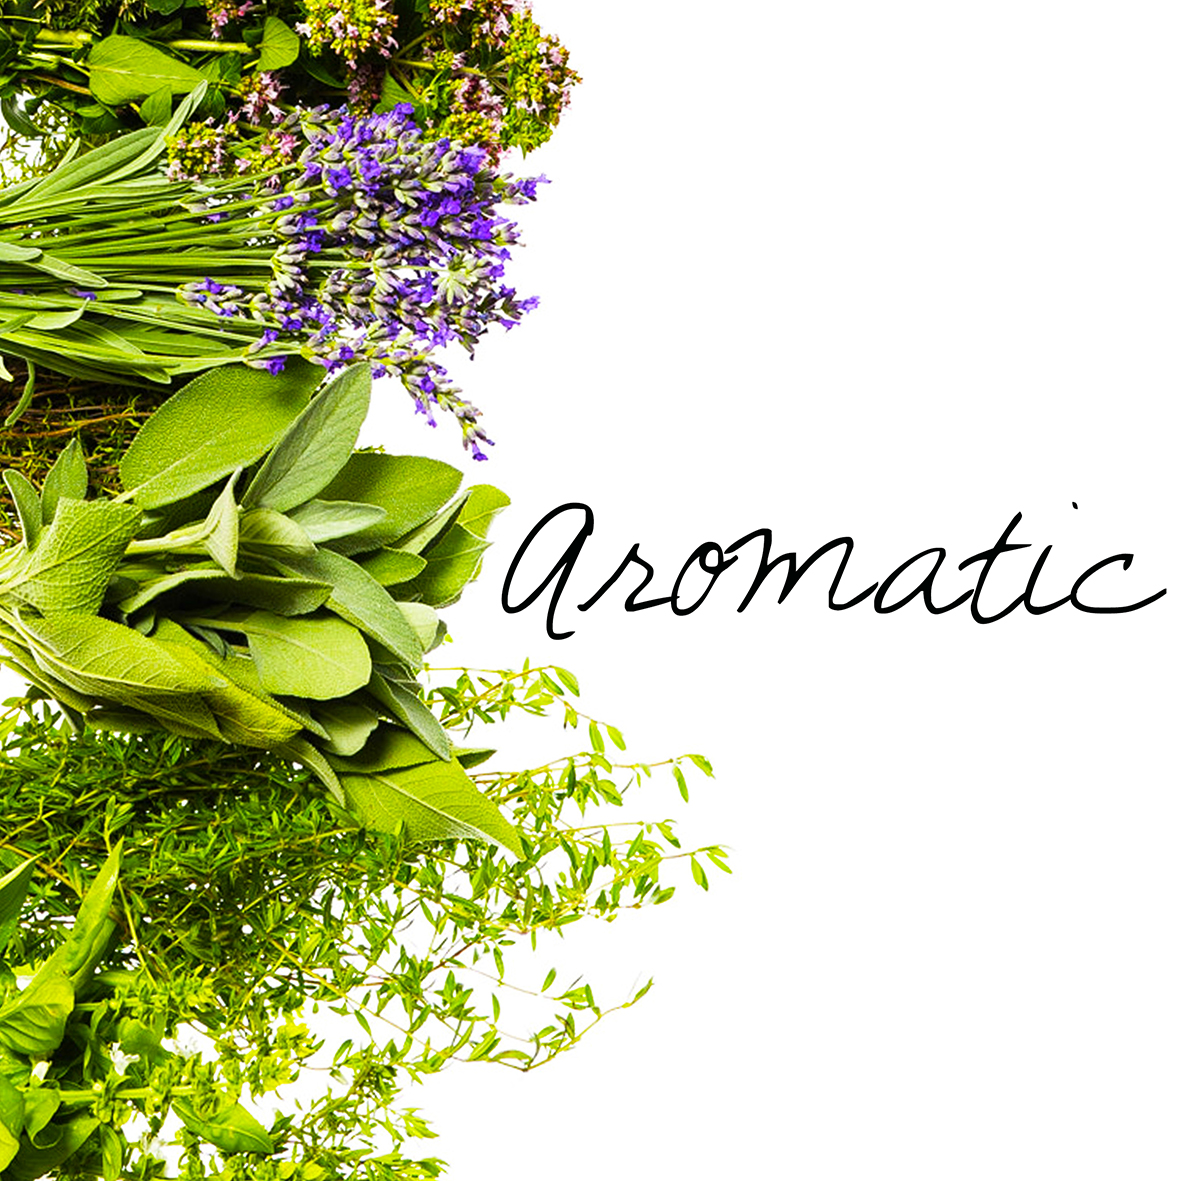 f-aromatic.jpg